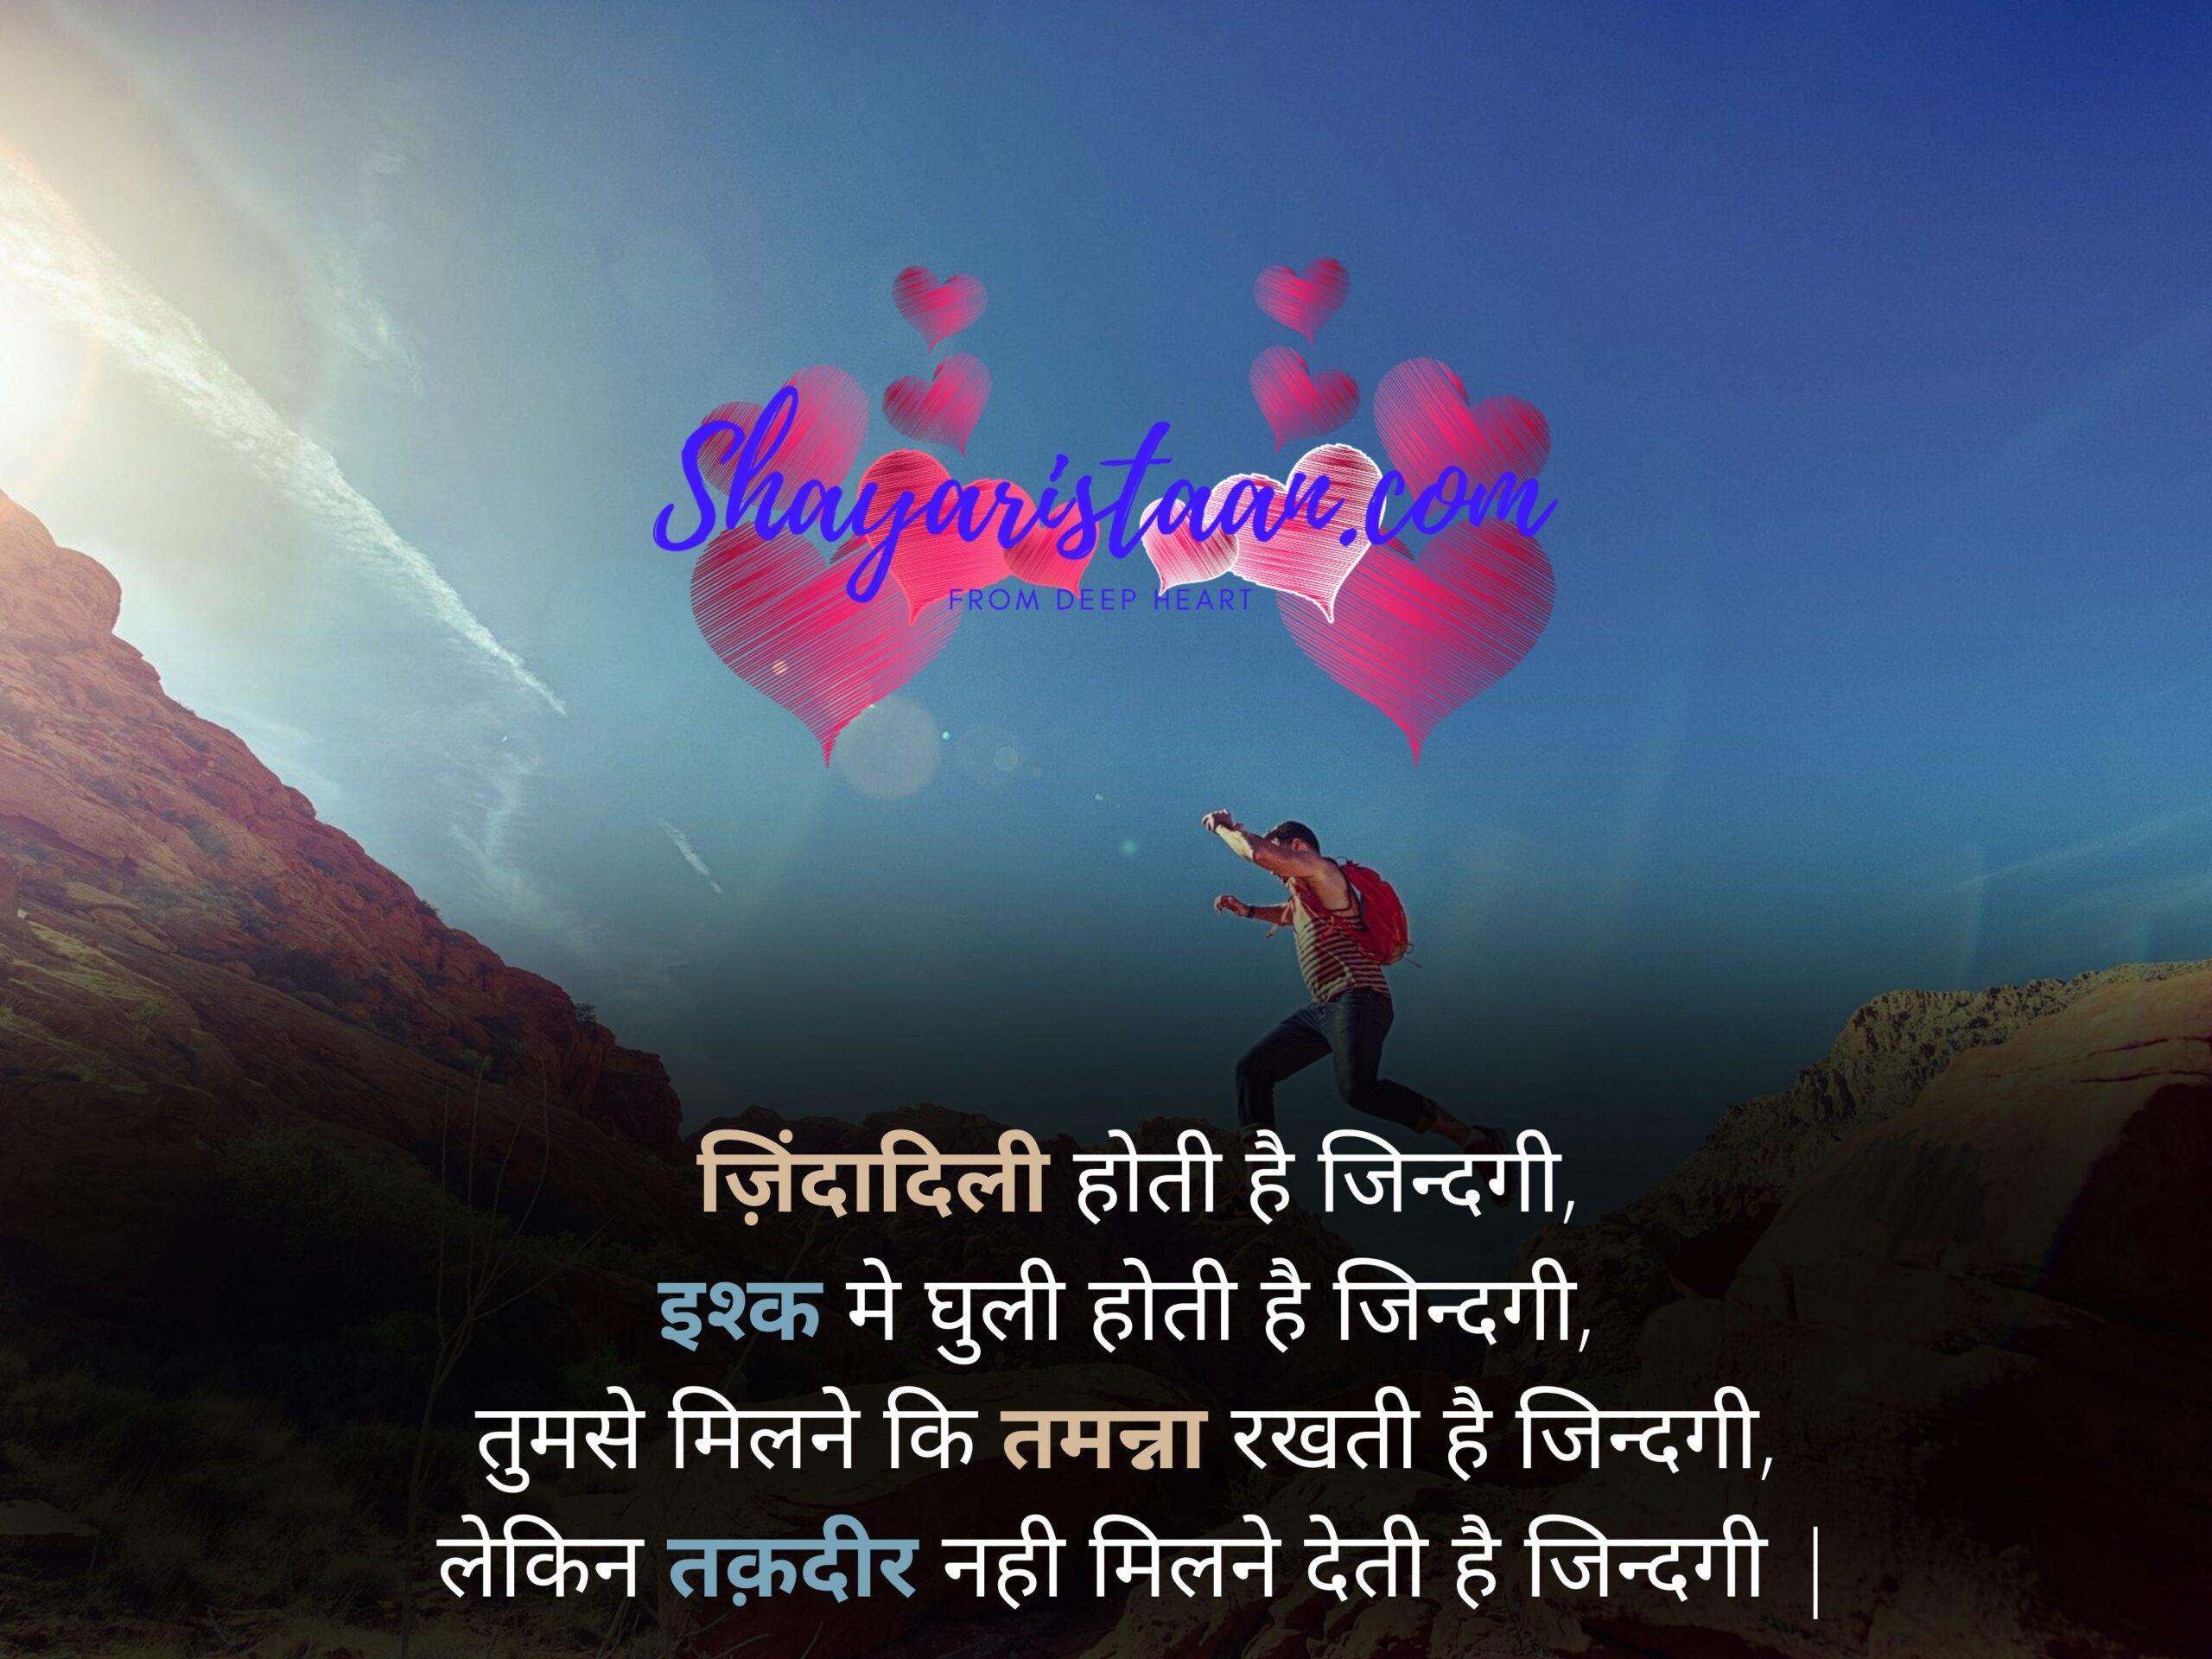 english shayari on life   ज़िंदादिली होती है जिन्दगी, इश्क मे घुली होती है जिन्दगी, तुमसे मिलने कि तमन्ना रखती है जिन्दगी, लेकिन तक़दीर नही मिलने देती है जिन्दगी  